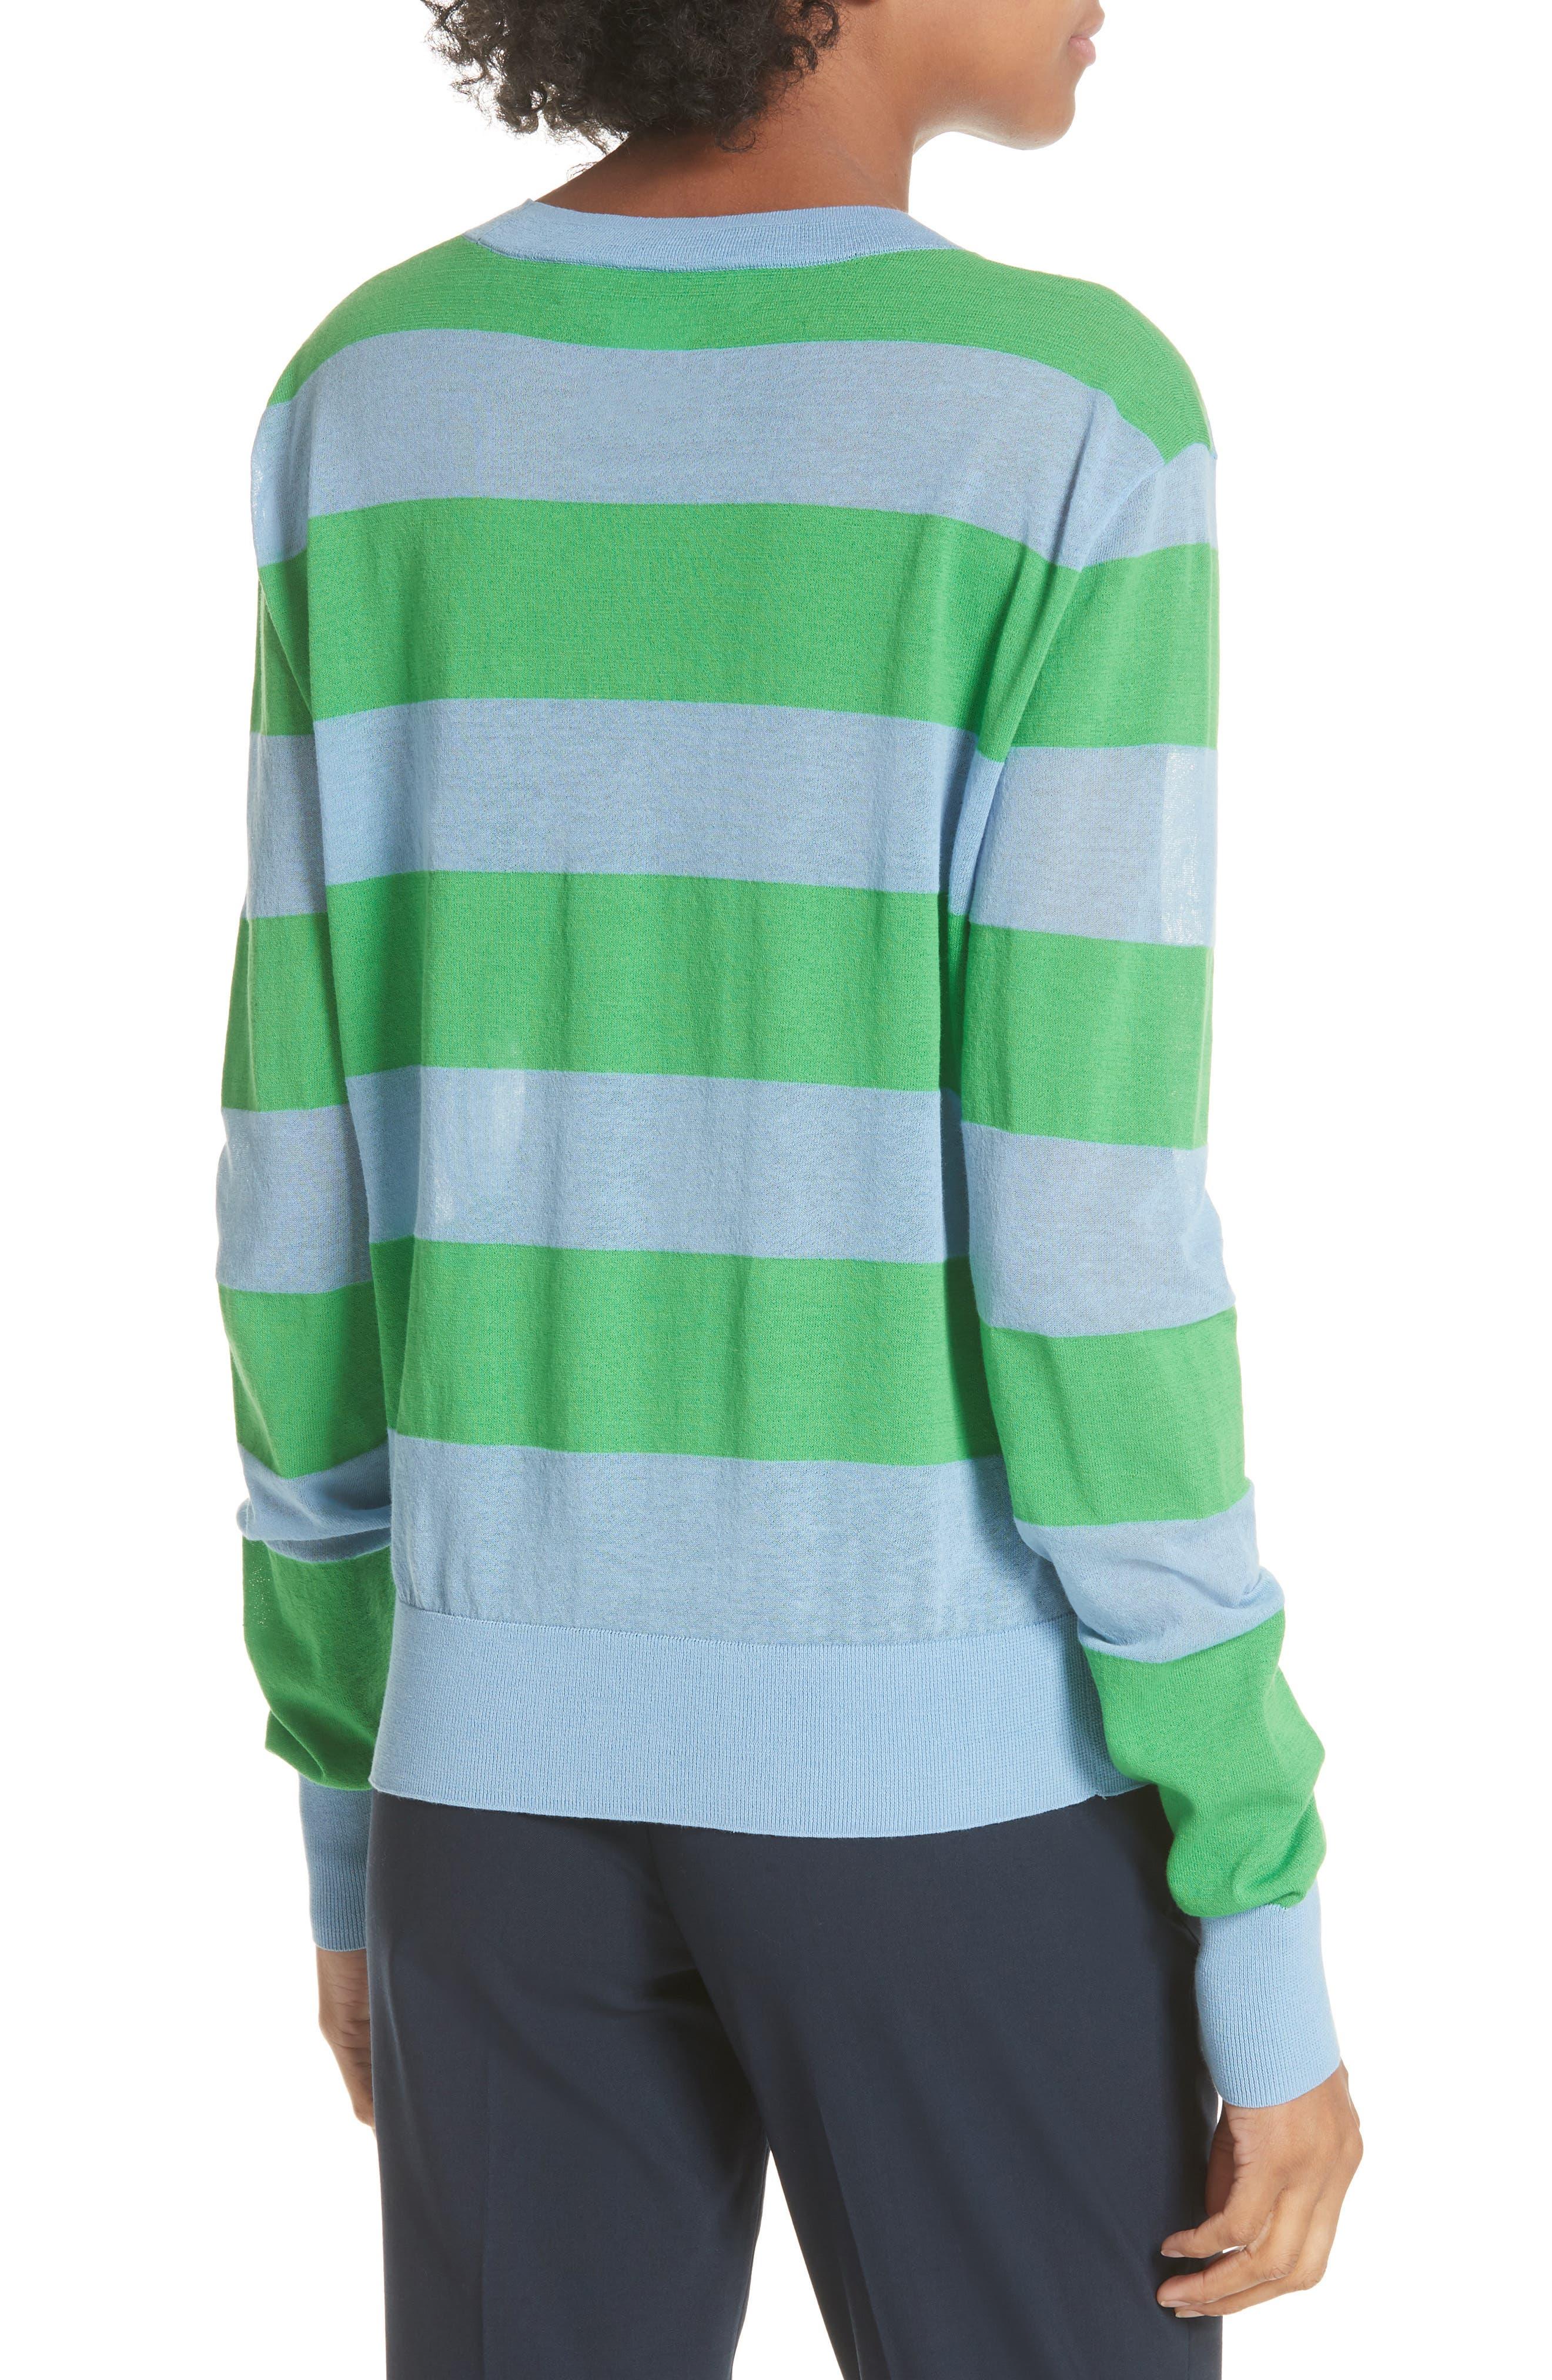 Diane von Furstenberg Colorblock Stripe Sweater,                             Alternate thumbnail 2, color,                             415